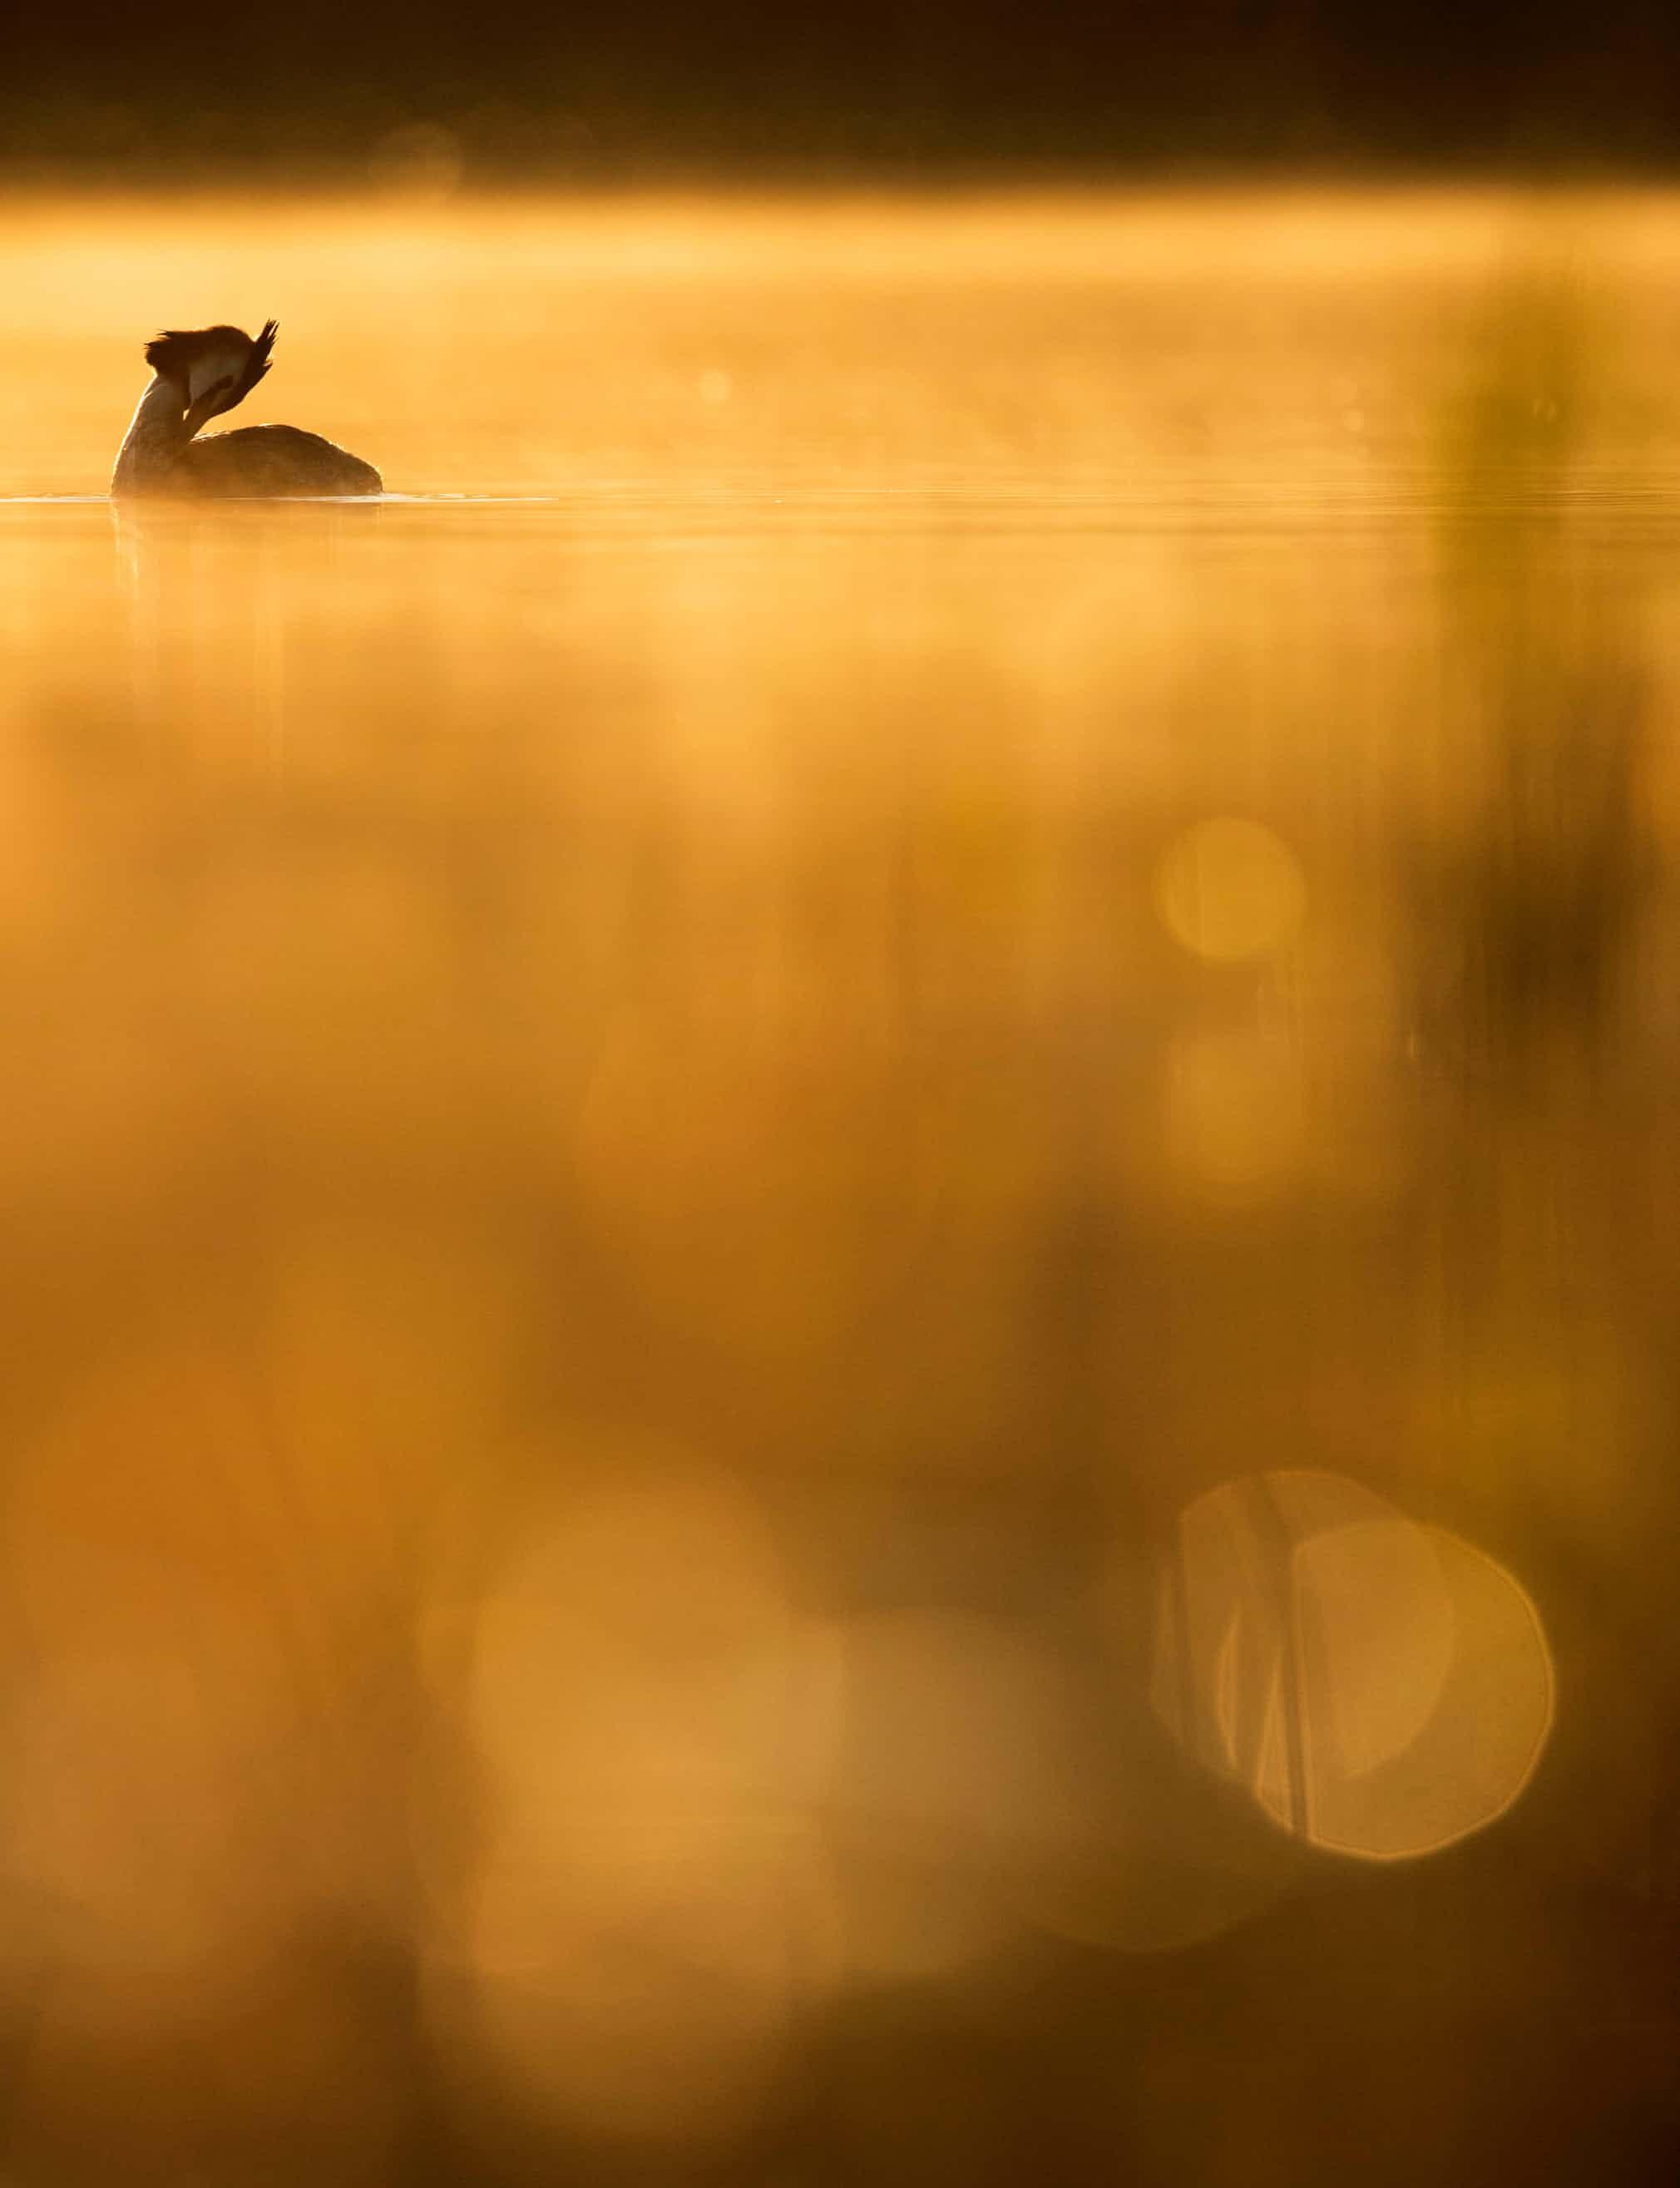 Щведский фотограф Йохан Карлберг победил вкатегории